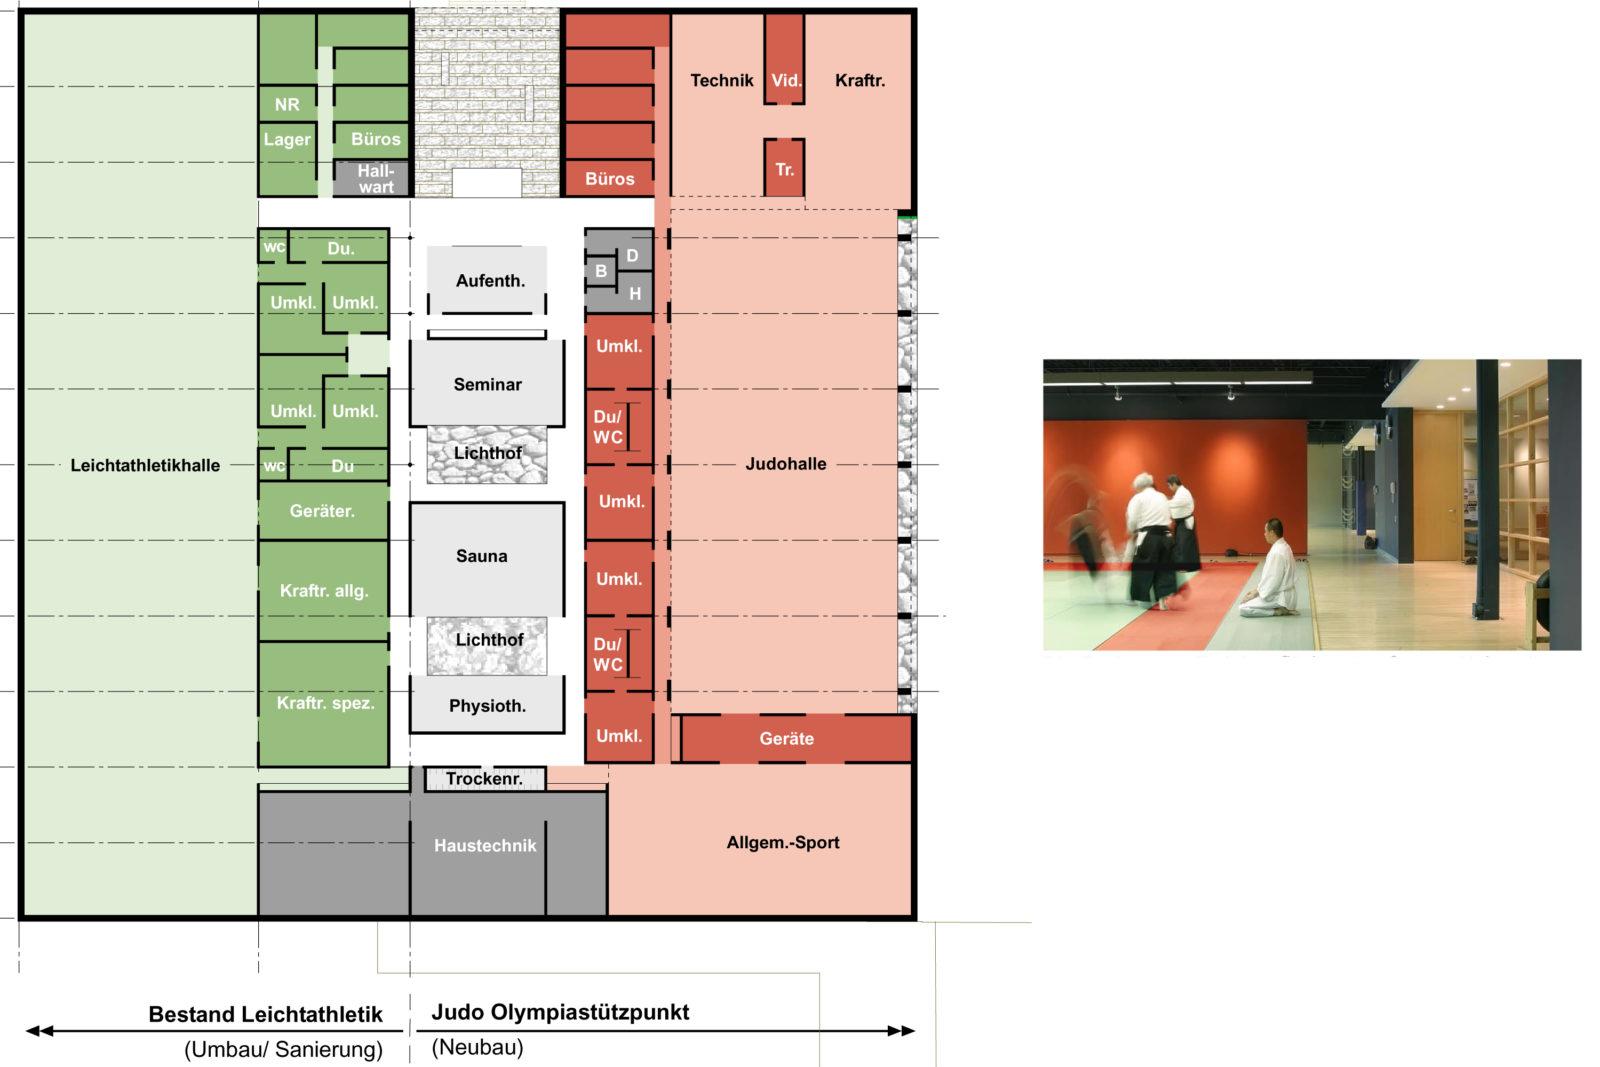 Trainingshalle Olympiastuetzpunkt Judoka und Leichtathletik Leipzig - Grundriss